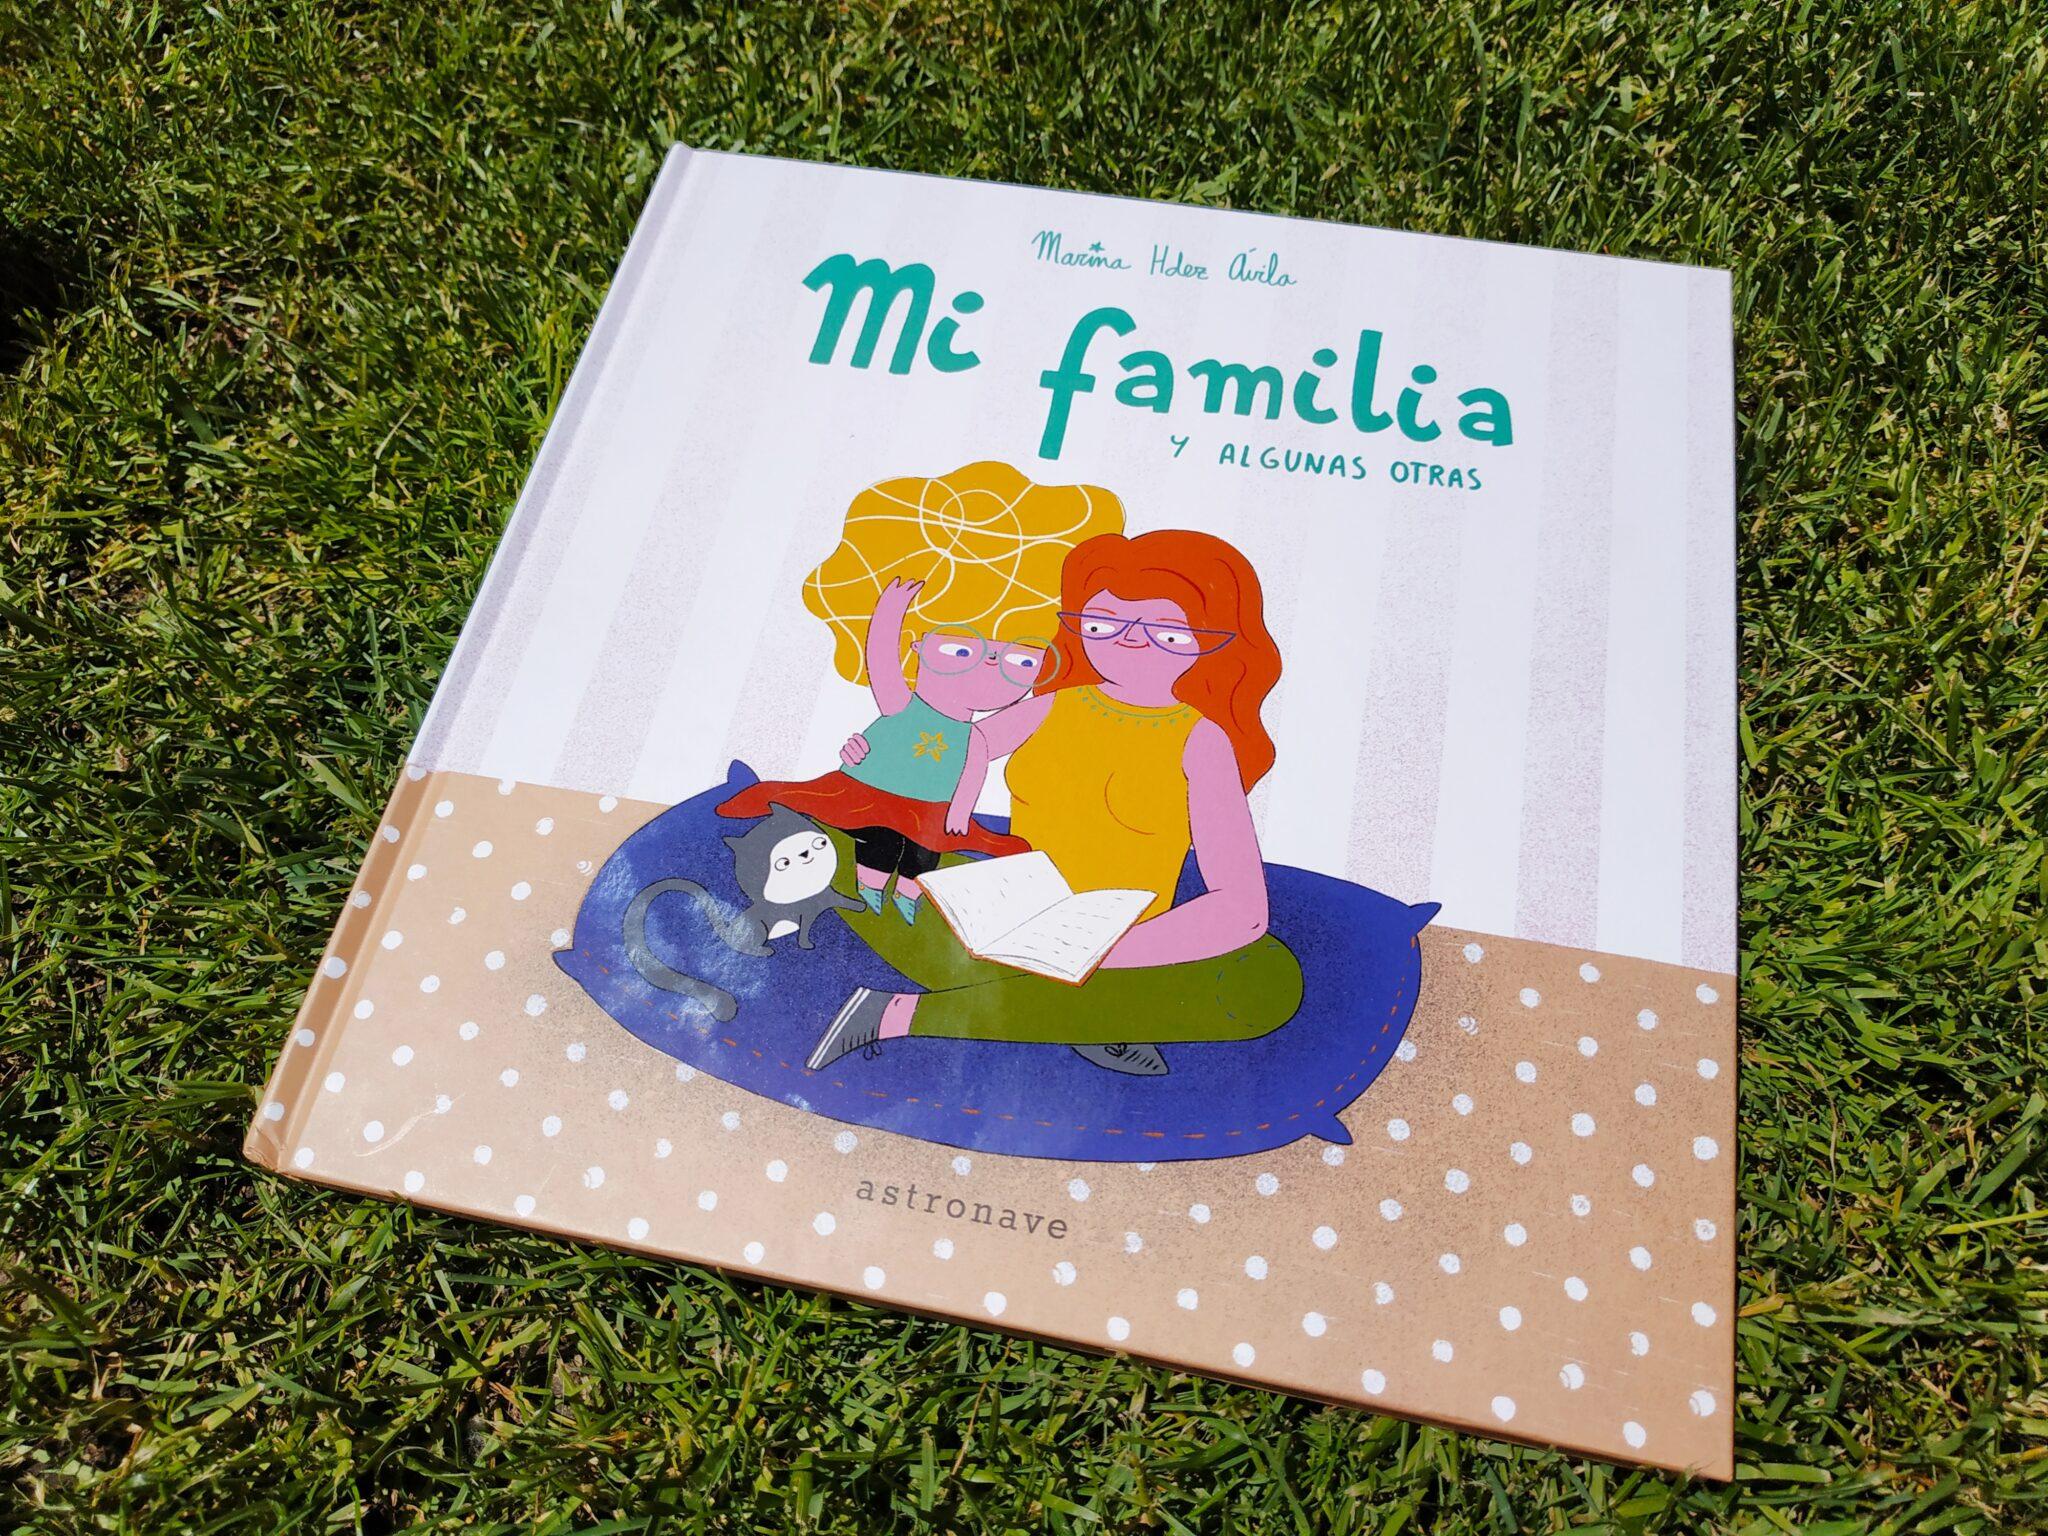 IMG 20190618 175437 1 - Tratar la diversidad familiar con Mi Familia